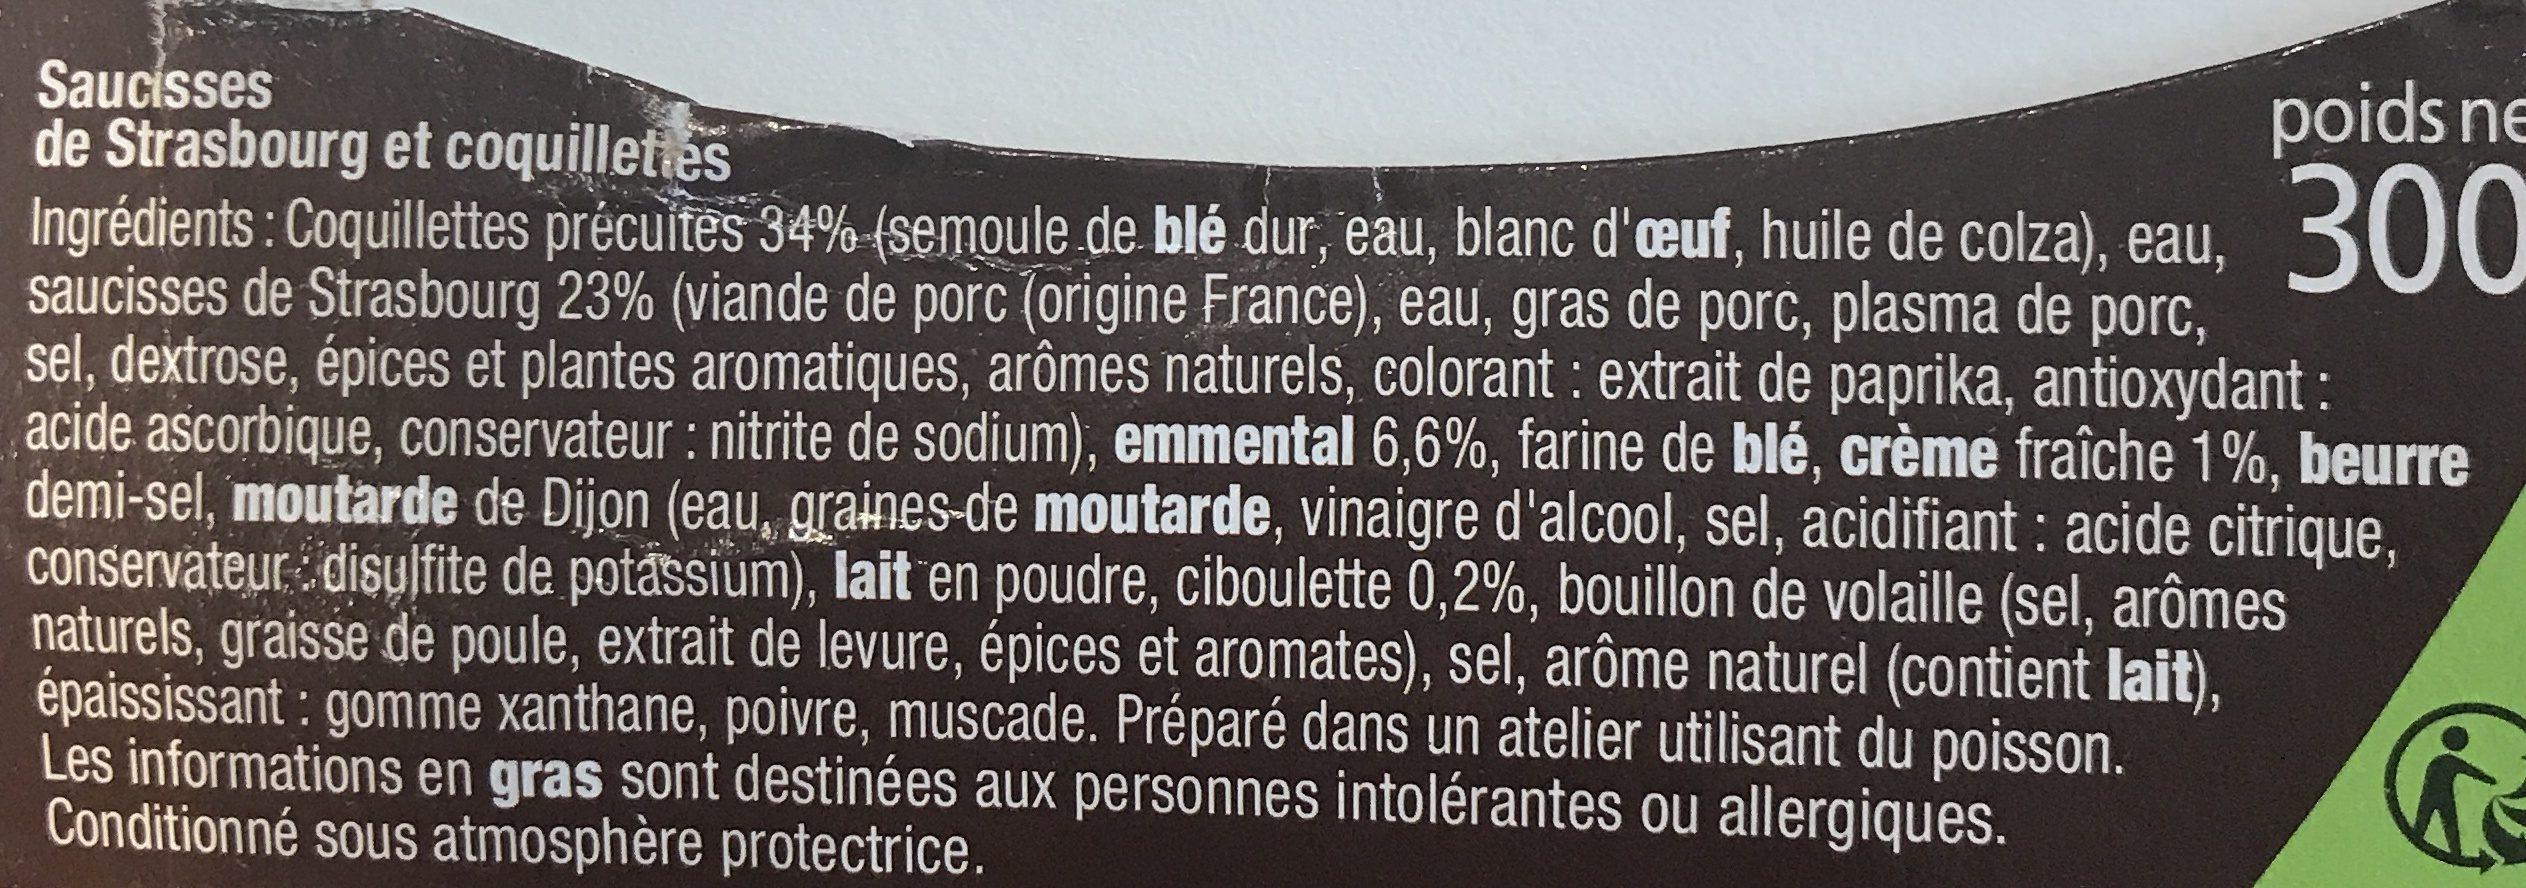 Saucisses de Strasbourg & coquillettes - Ingredients - fr